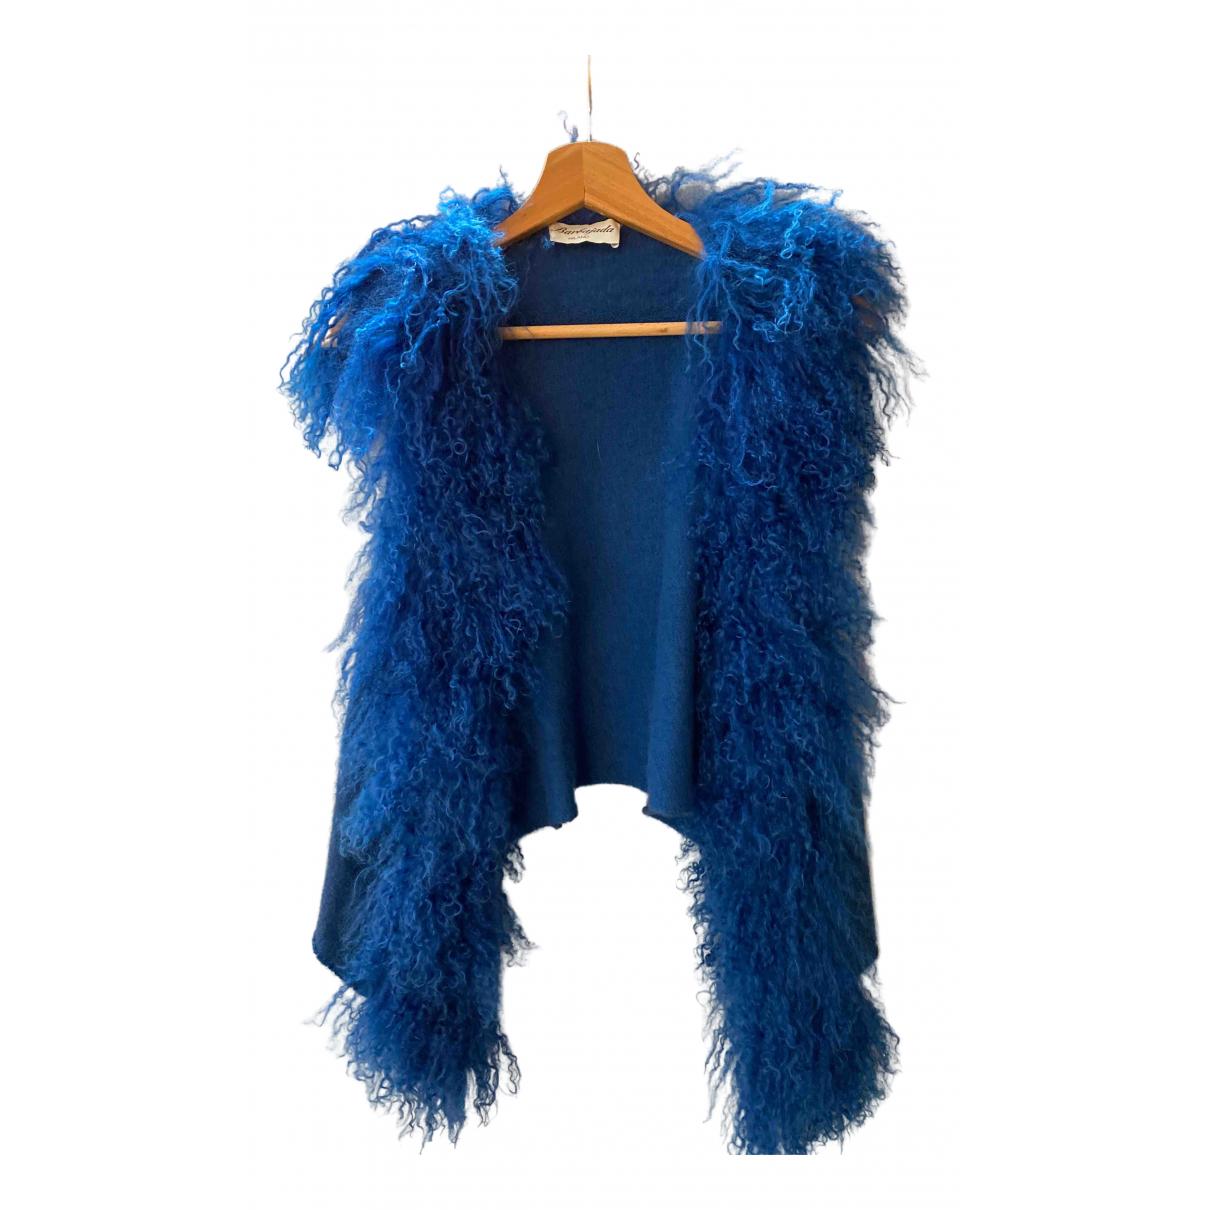 Barbajada - Pull   pour femme en fourrure - bleu